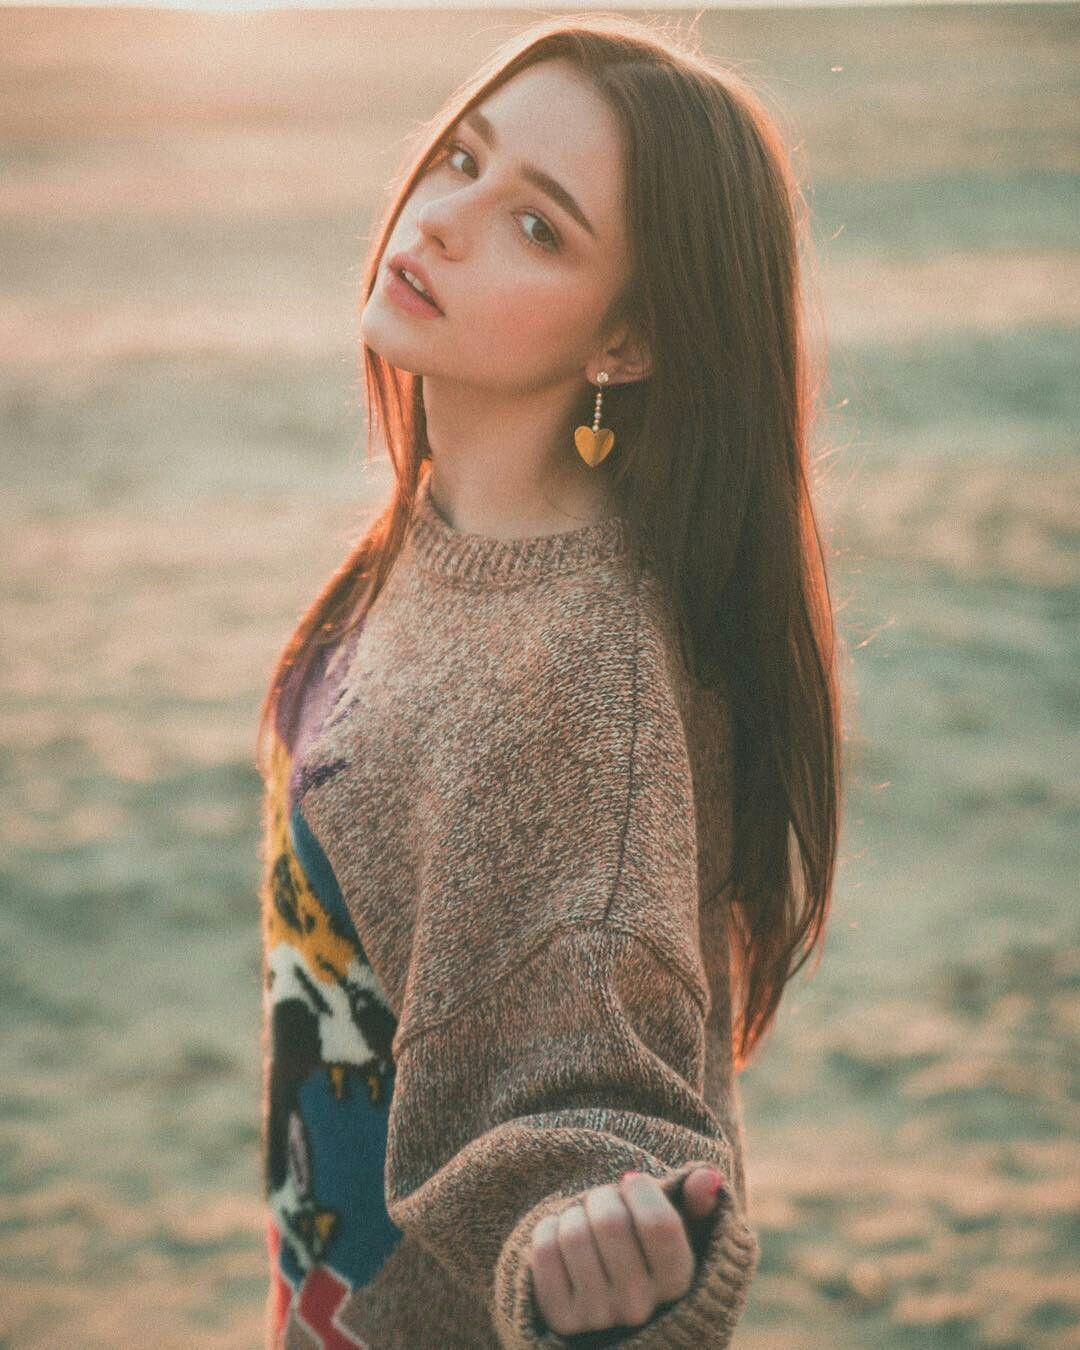 Makeup for black dress green eyes  Pin by ゞᥣᥲᥱᥡ on u Ulzzang Girls  Pinterest  Beauty Go